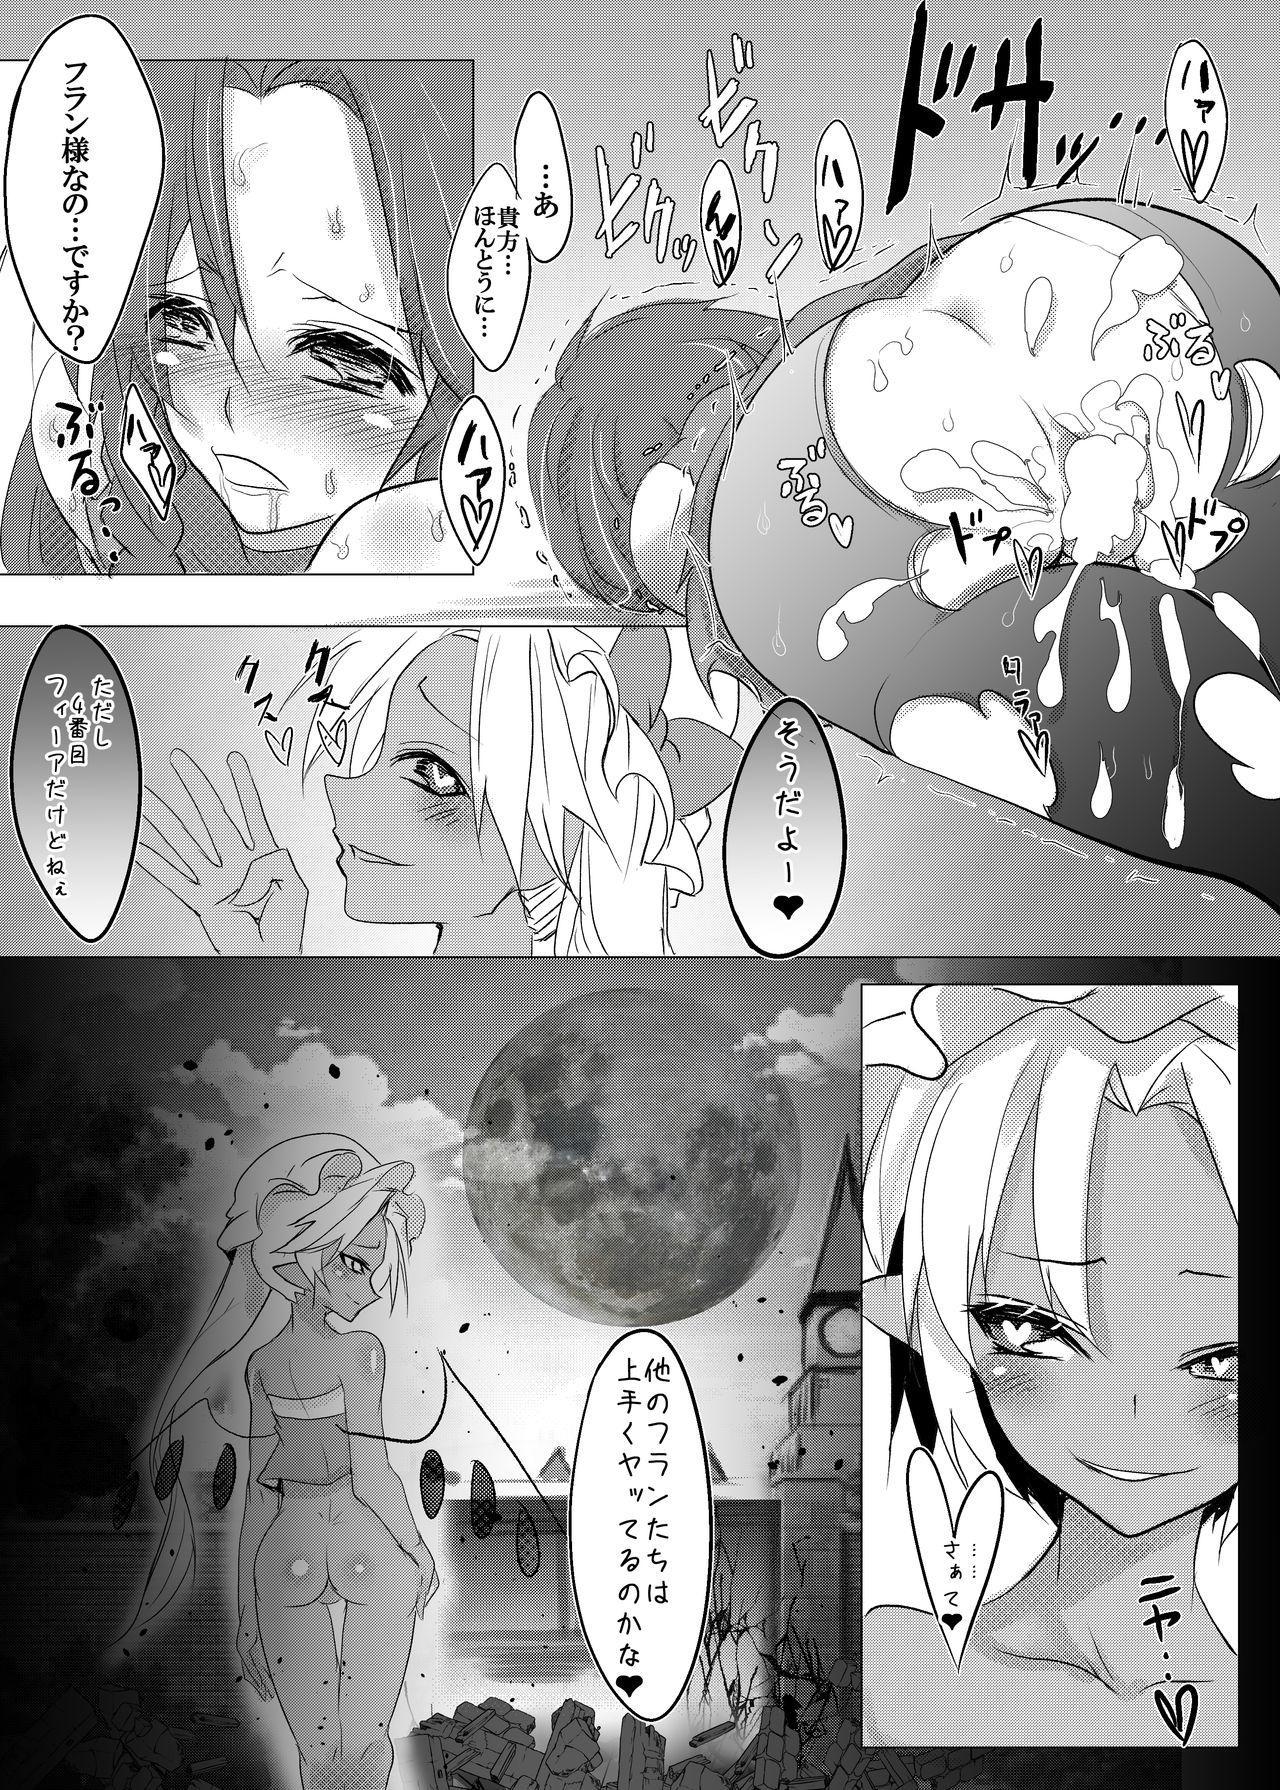 [Nakamura Nawo.] Four-of-a-Kind-chan-tachi ga Koumakan o Naburi ni Iku Hon (Touhou Project) 6